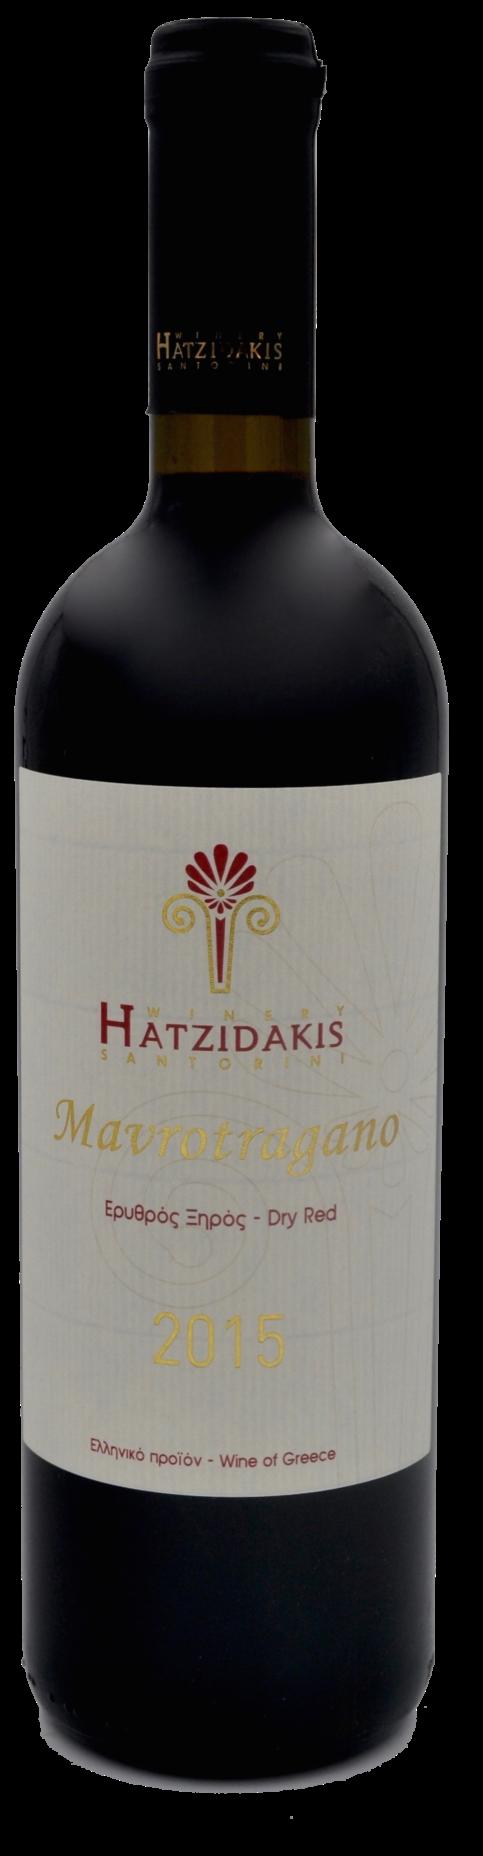 Domaine Hatzidakis - Mavrotragano - 2015